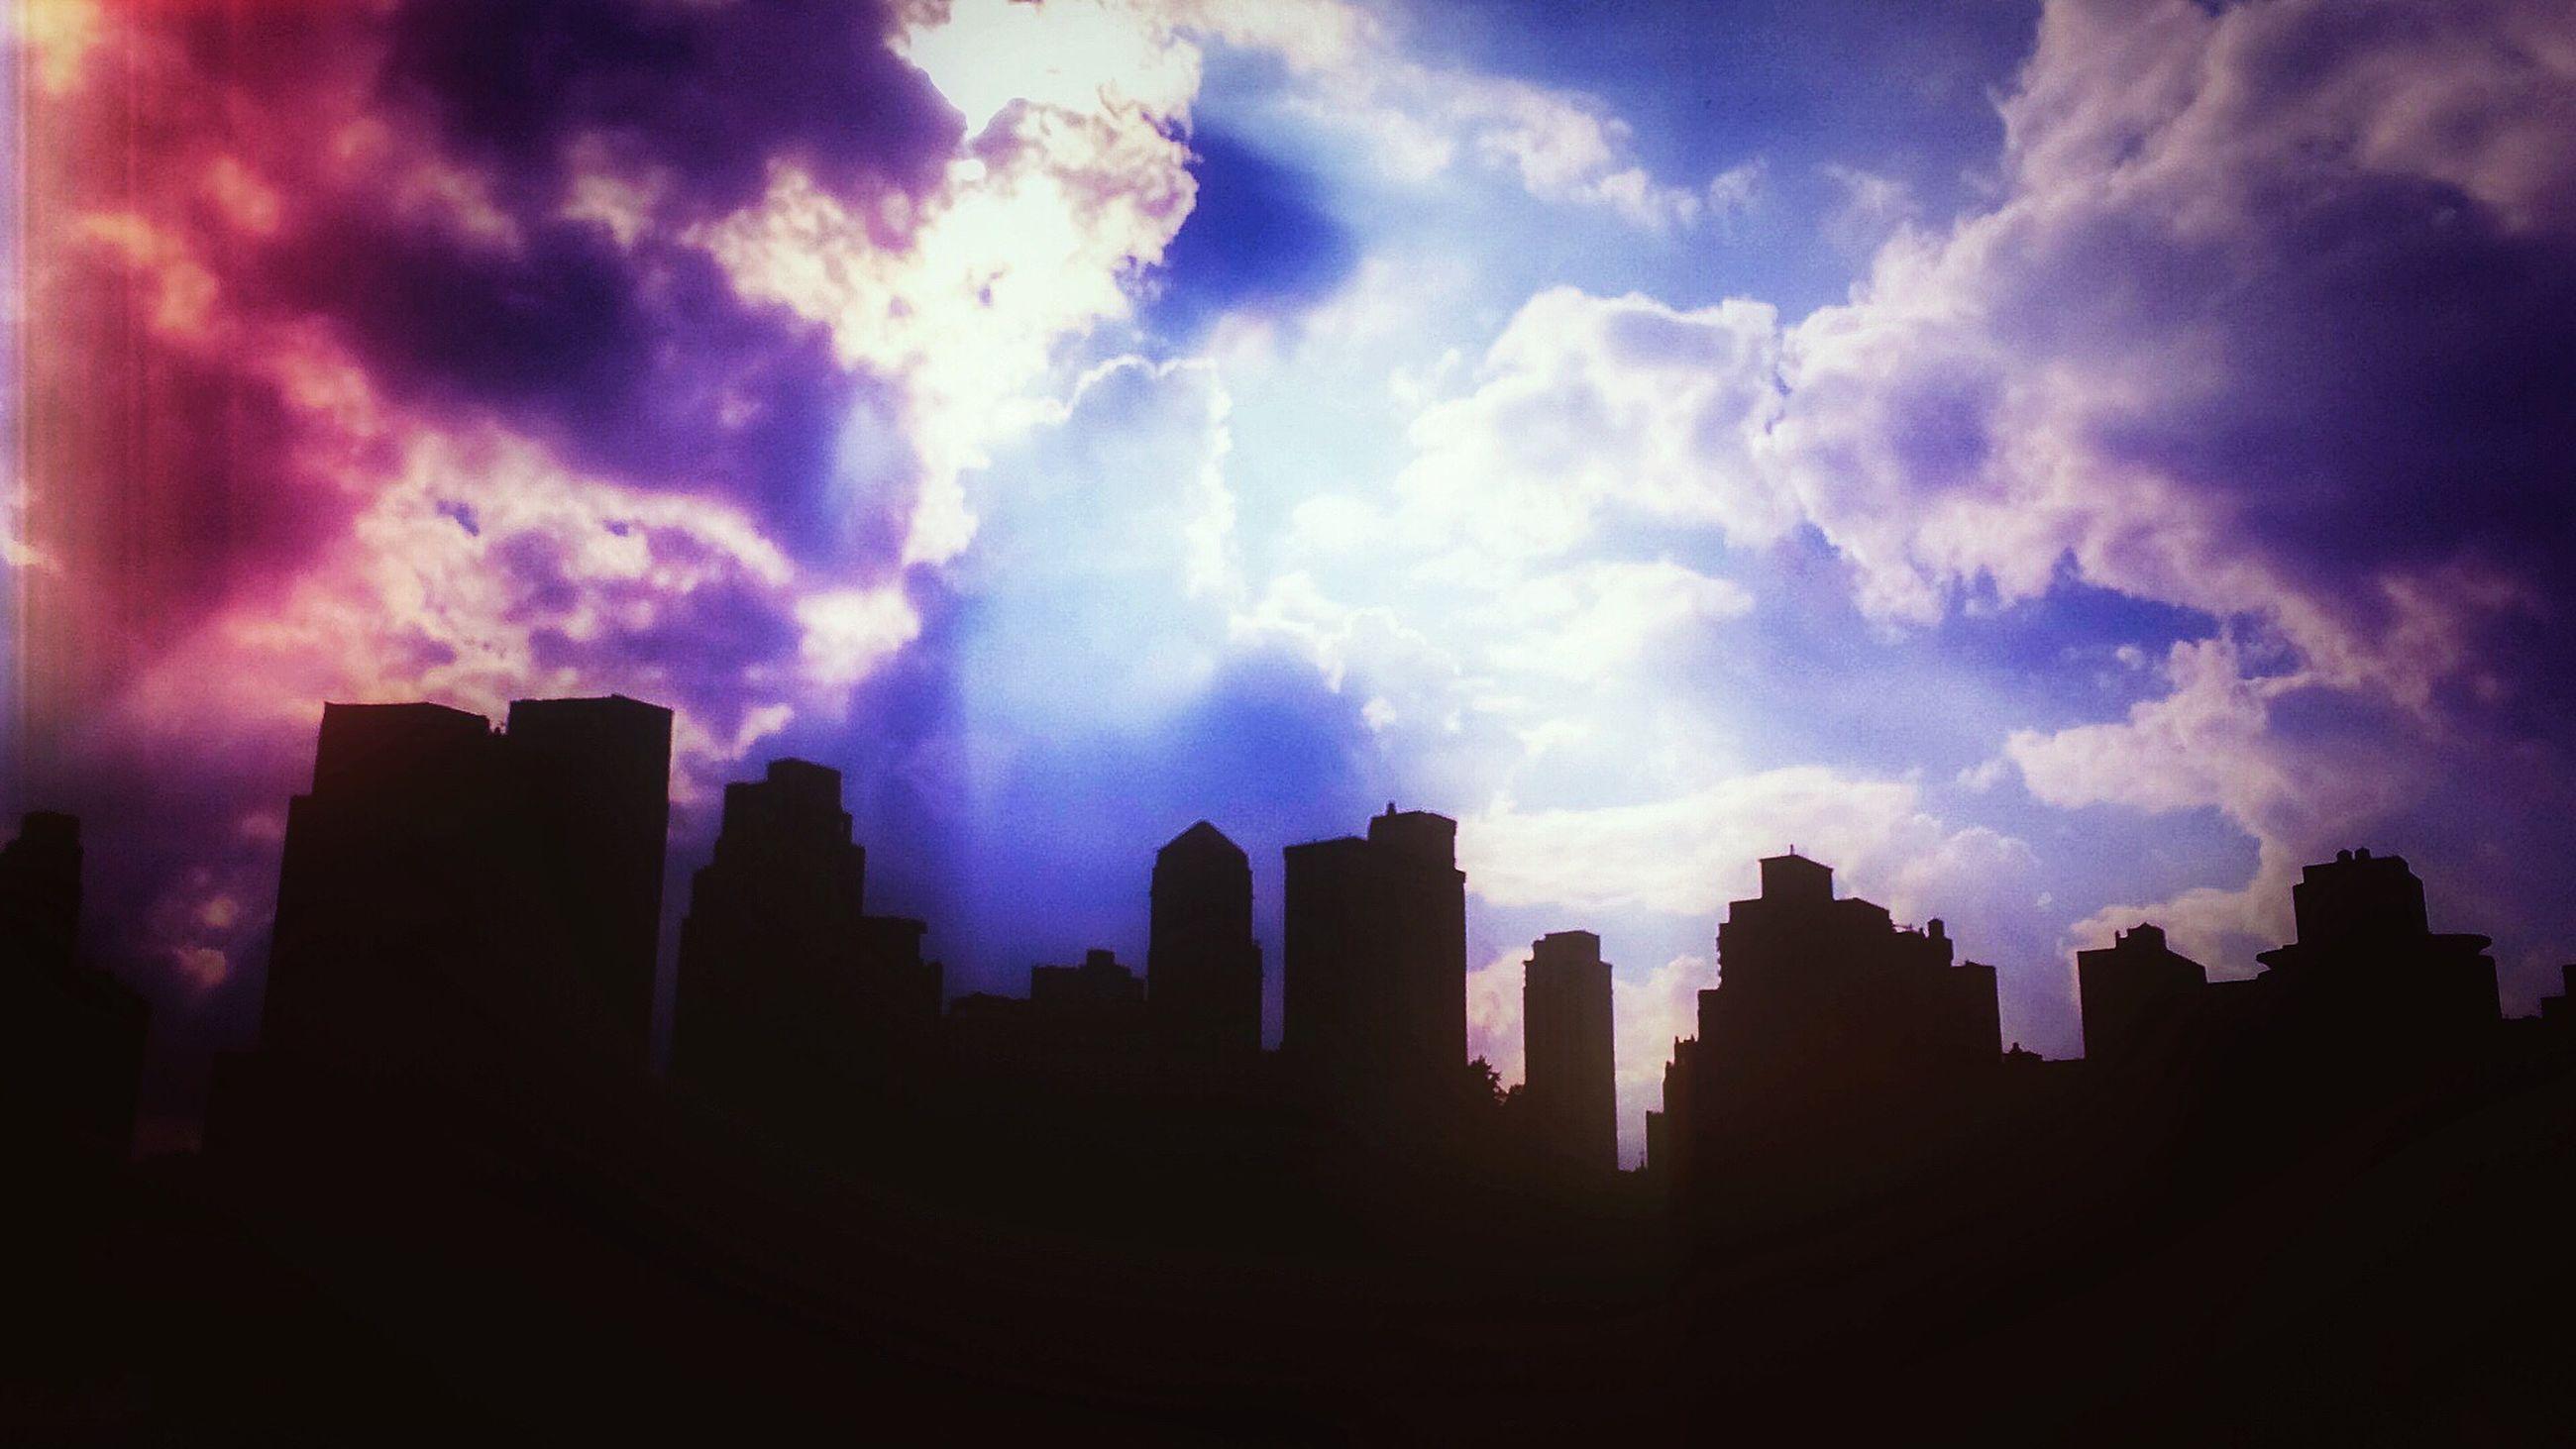 building exterior, architecture, sky, built structure, city, cloud - sky, silhouette, skyscraper, cityscape, cloudy, sunset, cloud, urban skyline, sunbeam, outdoors, travel destinations, building, dark, weather, dusk